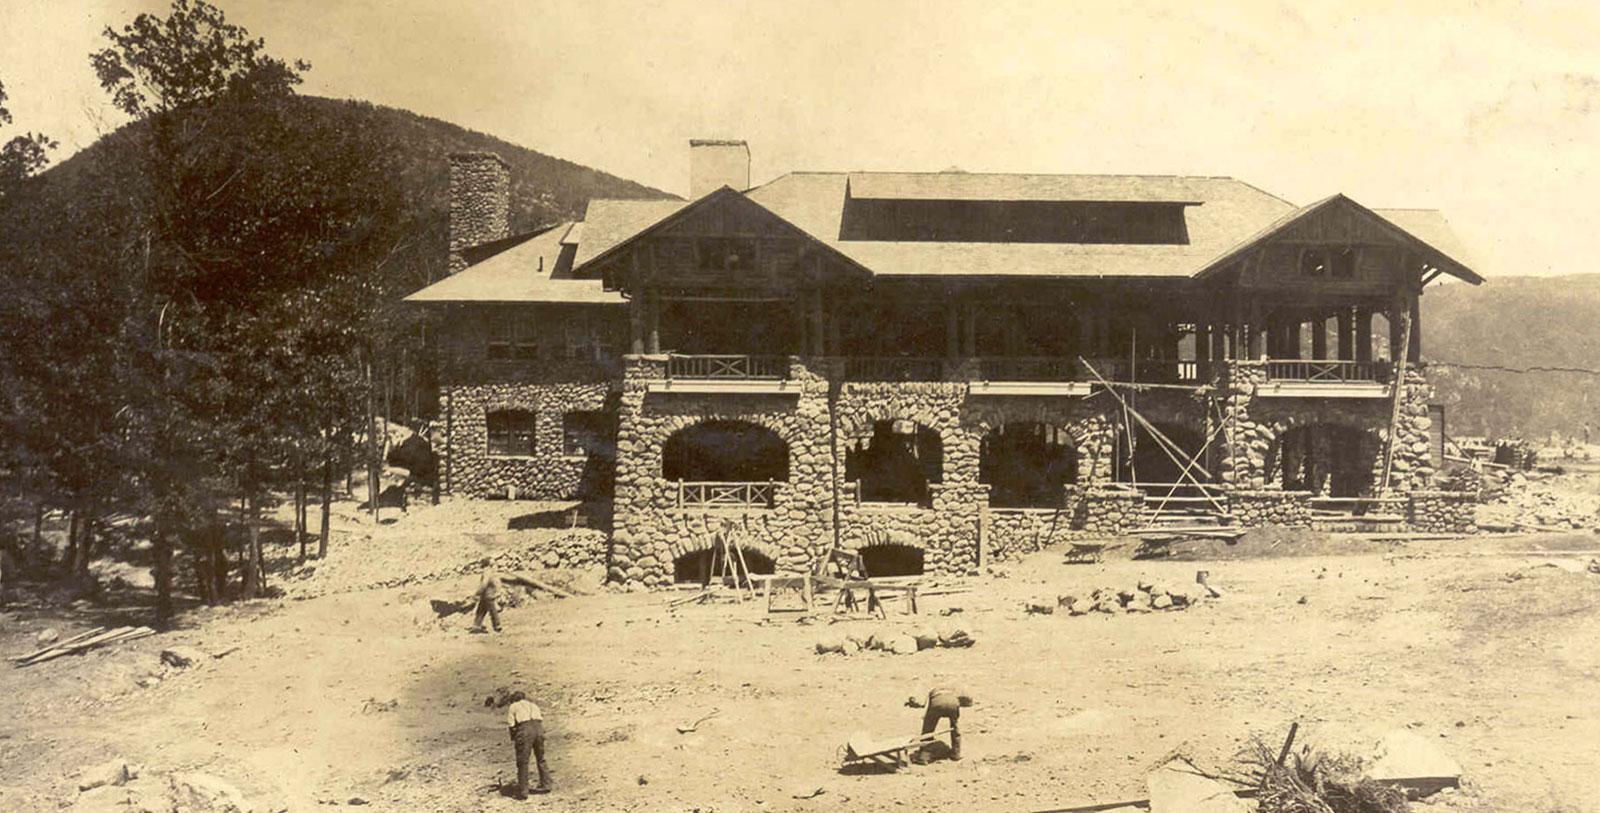 Historic Image of Hotel Construction in 1915 Bear Mountain Inn in Bear Mountain, New York